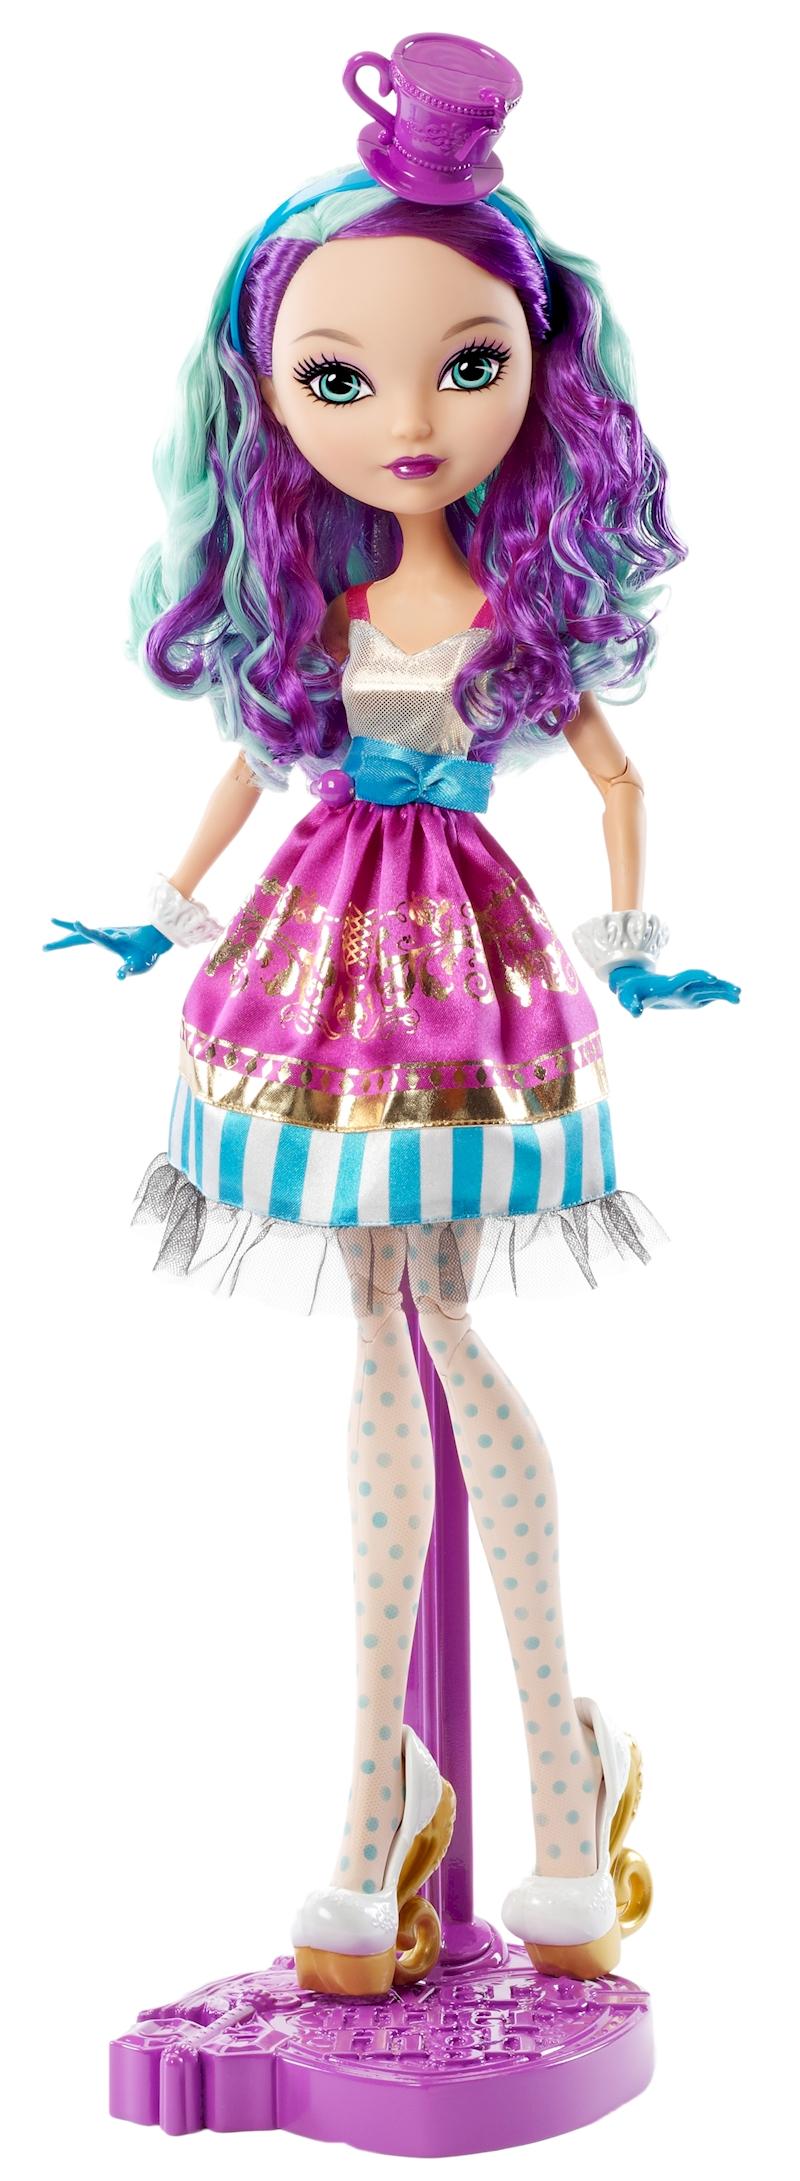 ever after high madeline hatter large scale doll shop ever